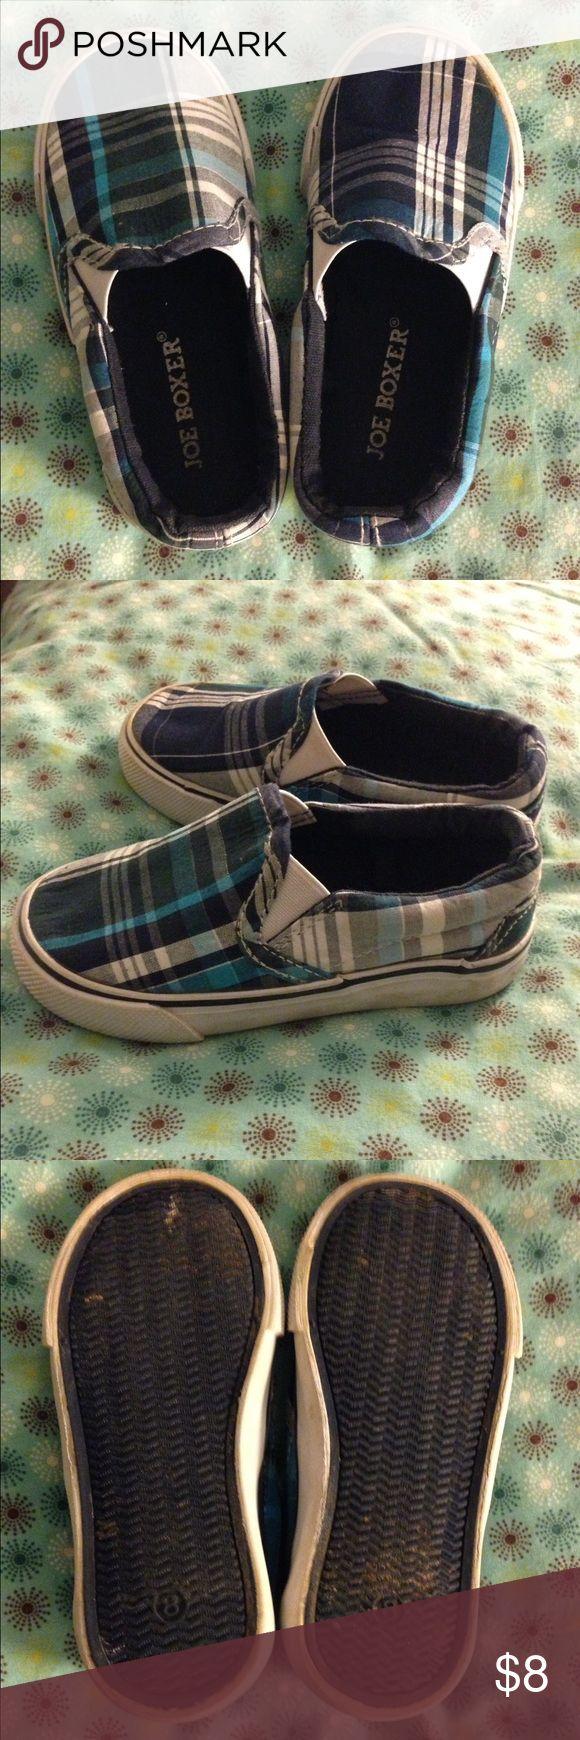 Joe Boxer slip-on canvas sneakers Adorable plaid shoes. Worn rarely. Joe Boxer Shoes Sneakers